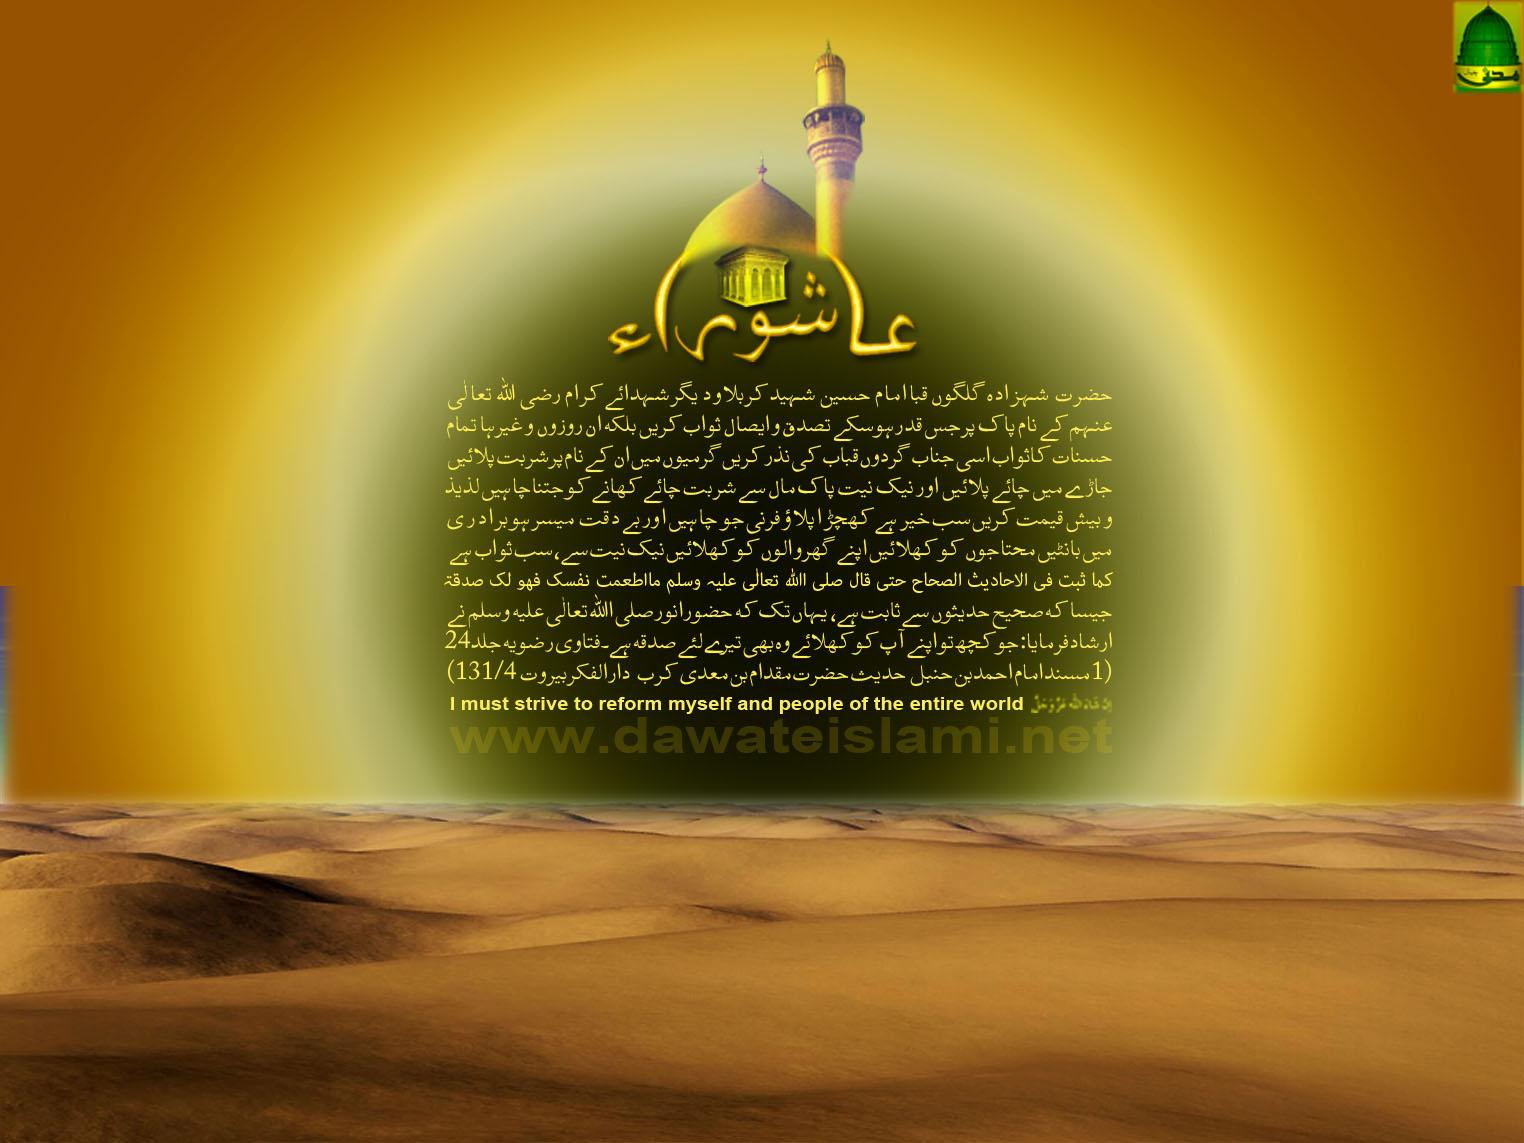 muharram wallpaper 10 ul - photo #15